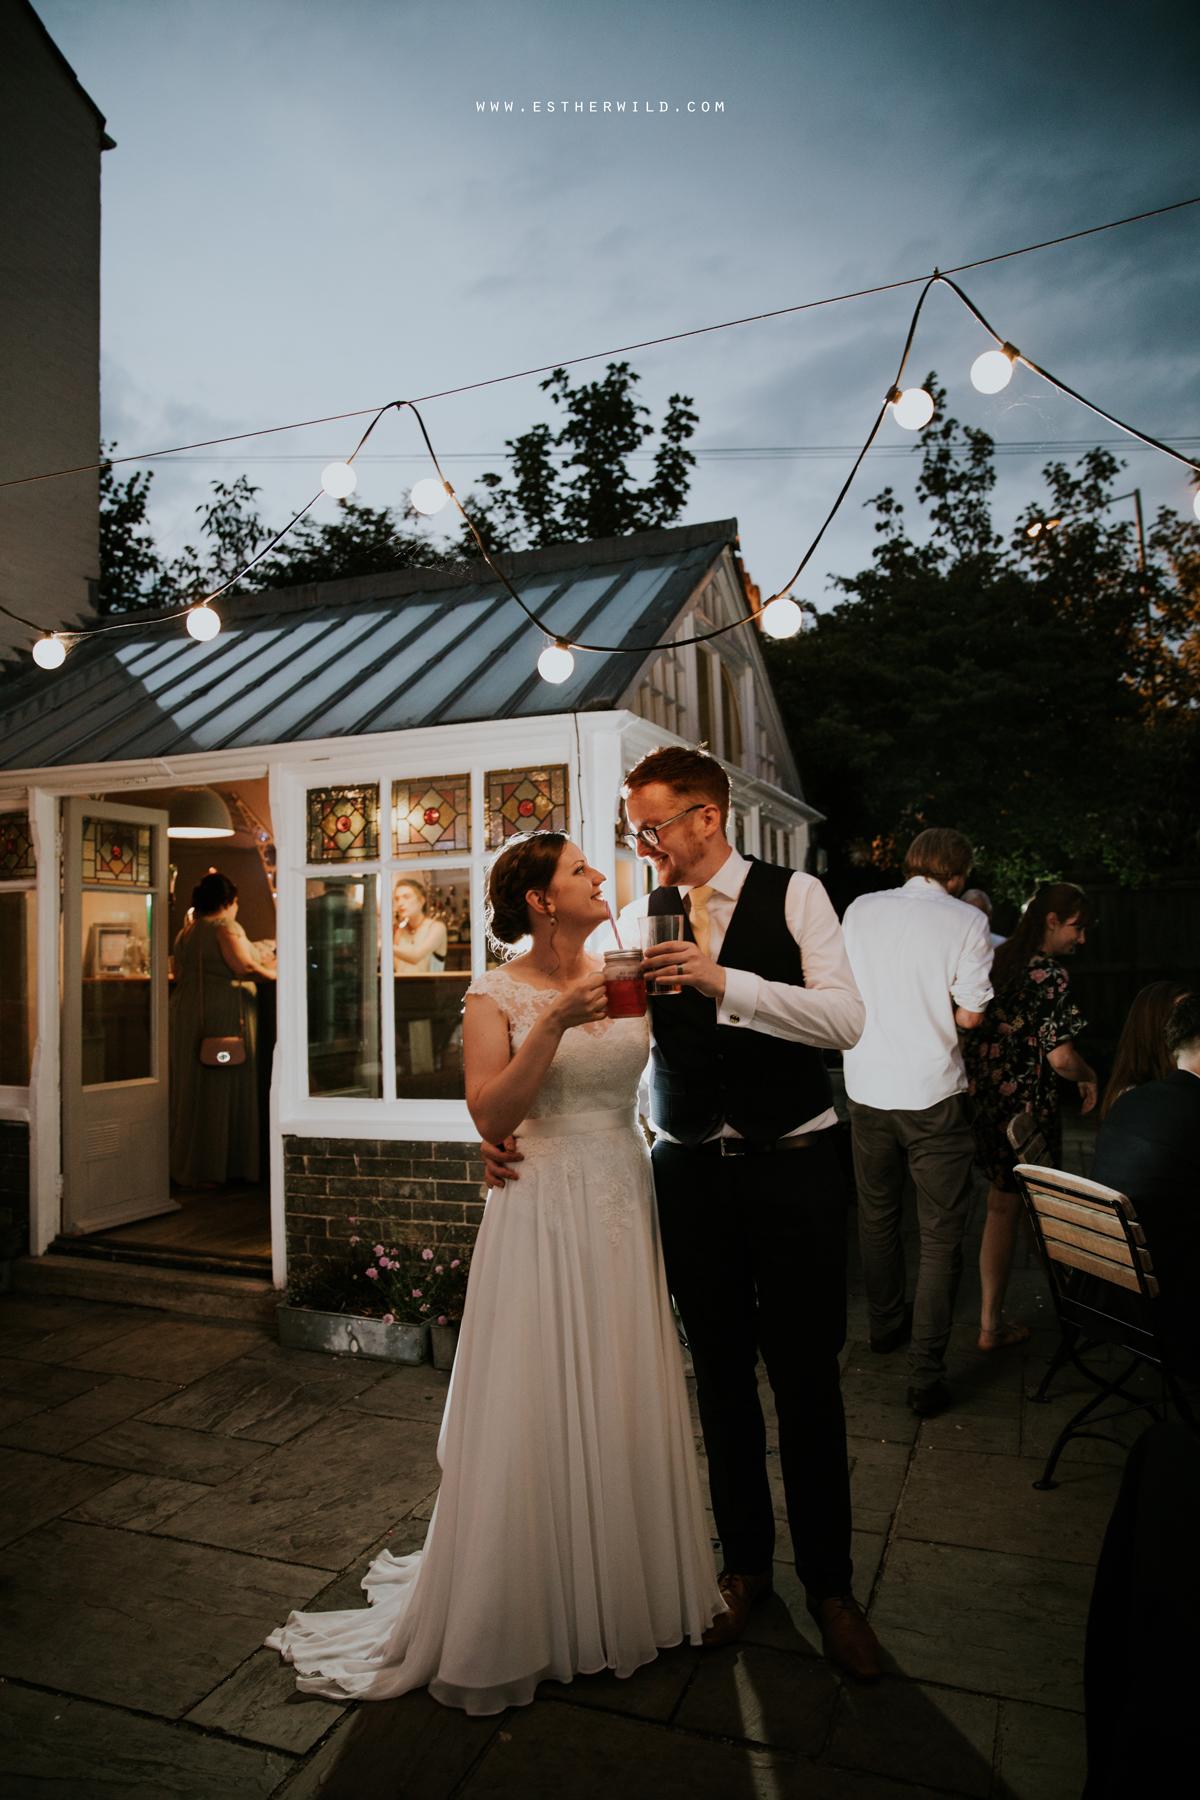 The_Georgian_Townhouse_Wedding_Norwich_Esther_Wild_Photographer_3R8A3293.jpg